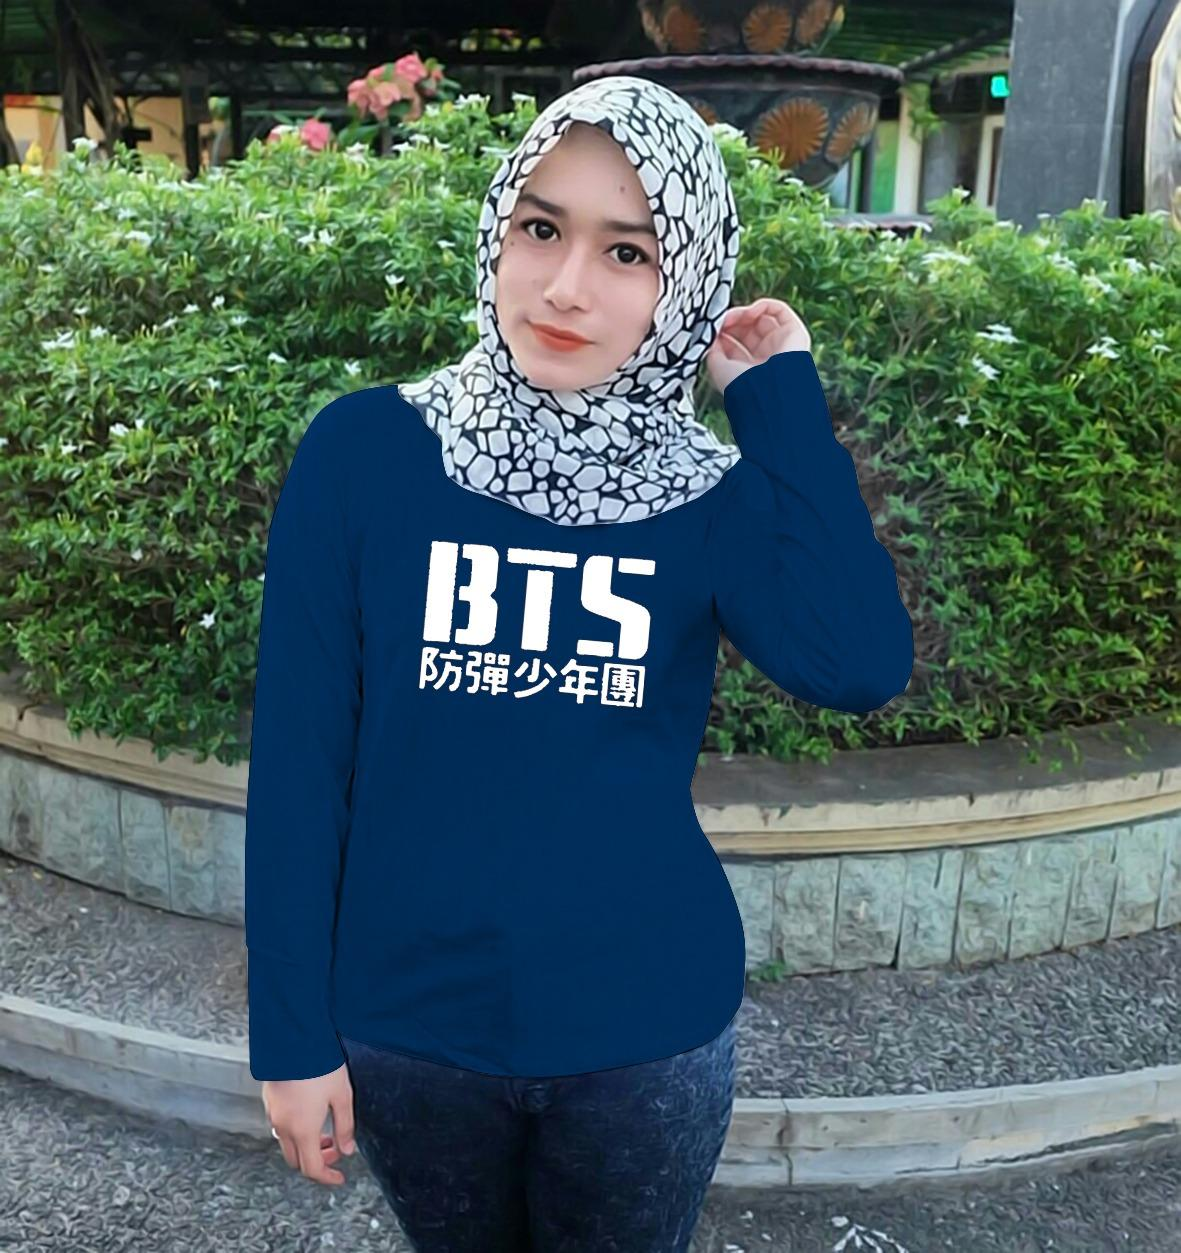 XV Kaos Wanita Tshirt XAVIER BTS KOREA LENGAN PANJANG / T-shirt Distro Wanita /